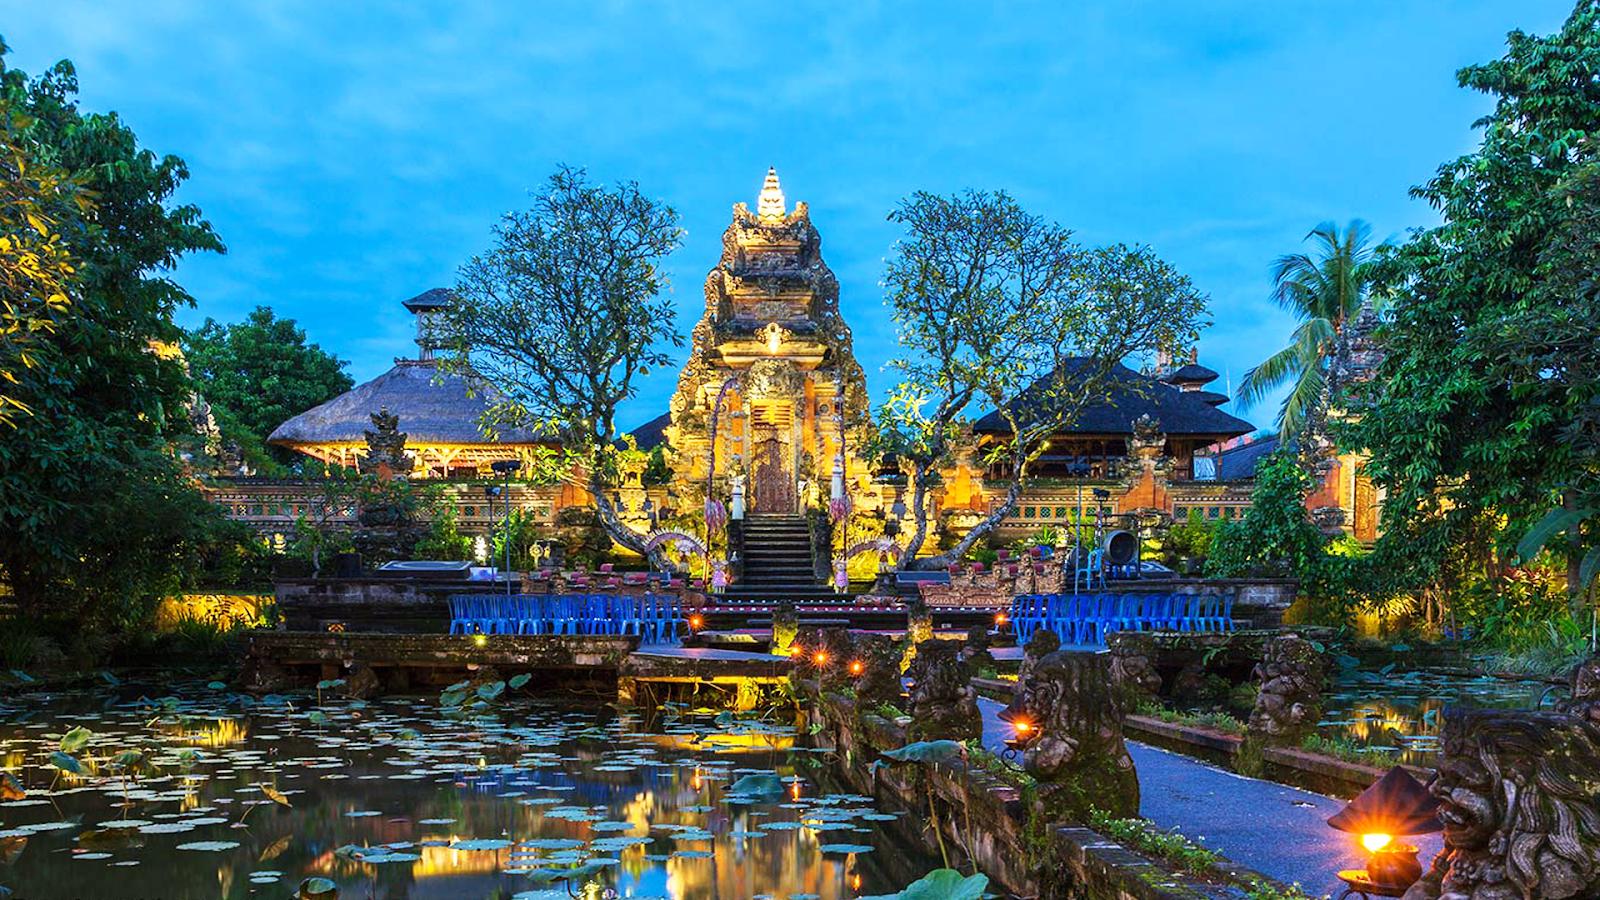 Ubud Royal Palace | Sunia Bali Tour